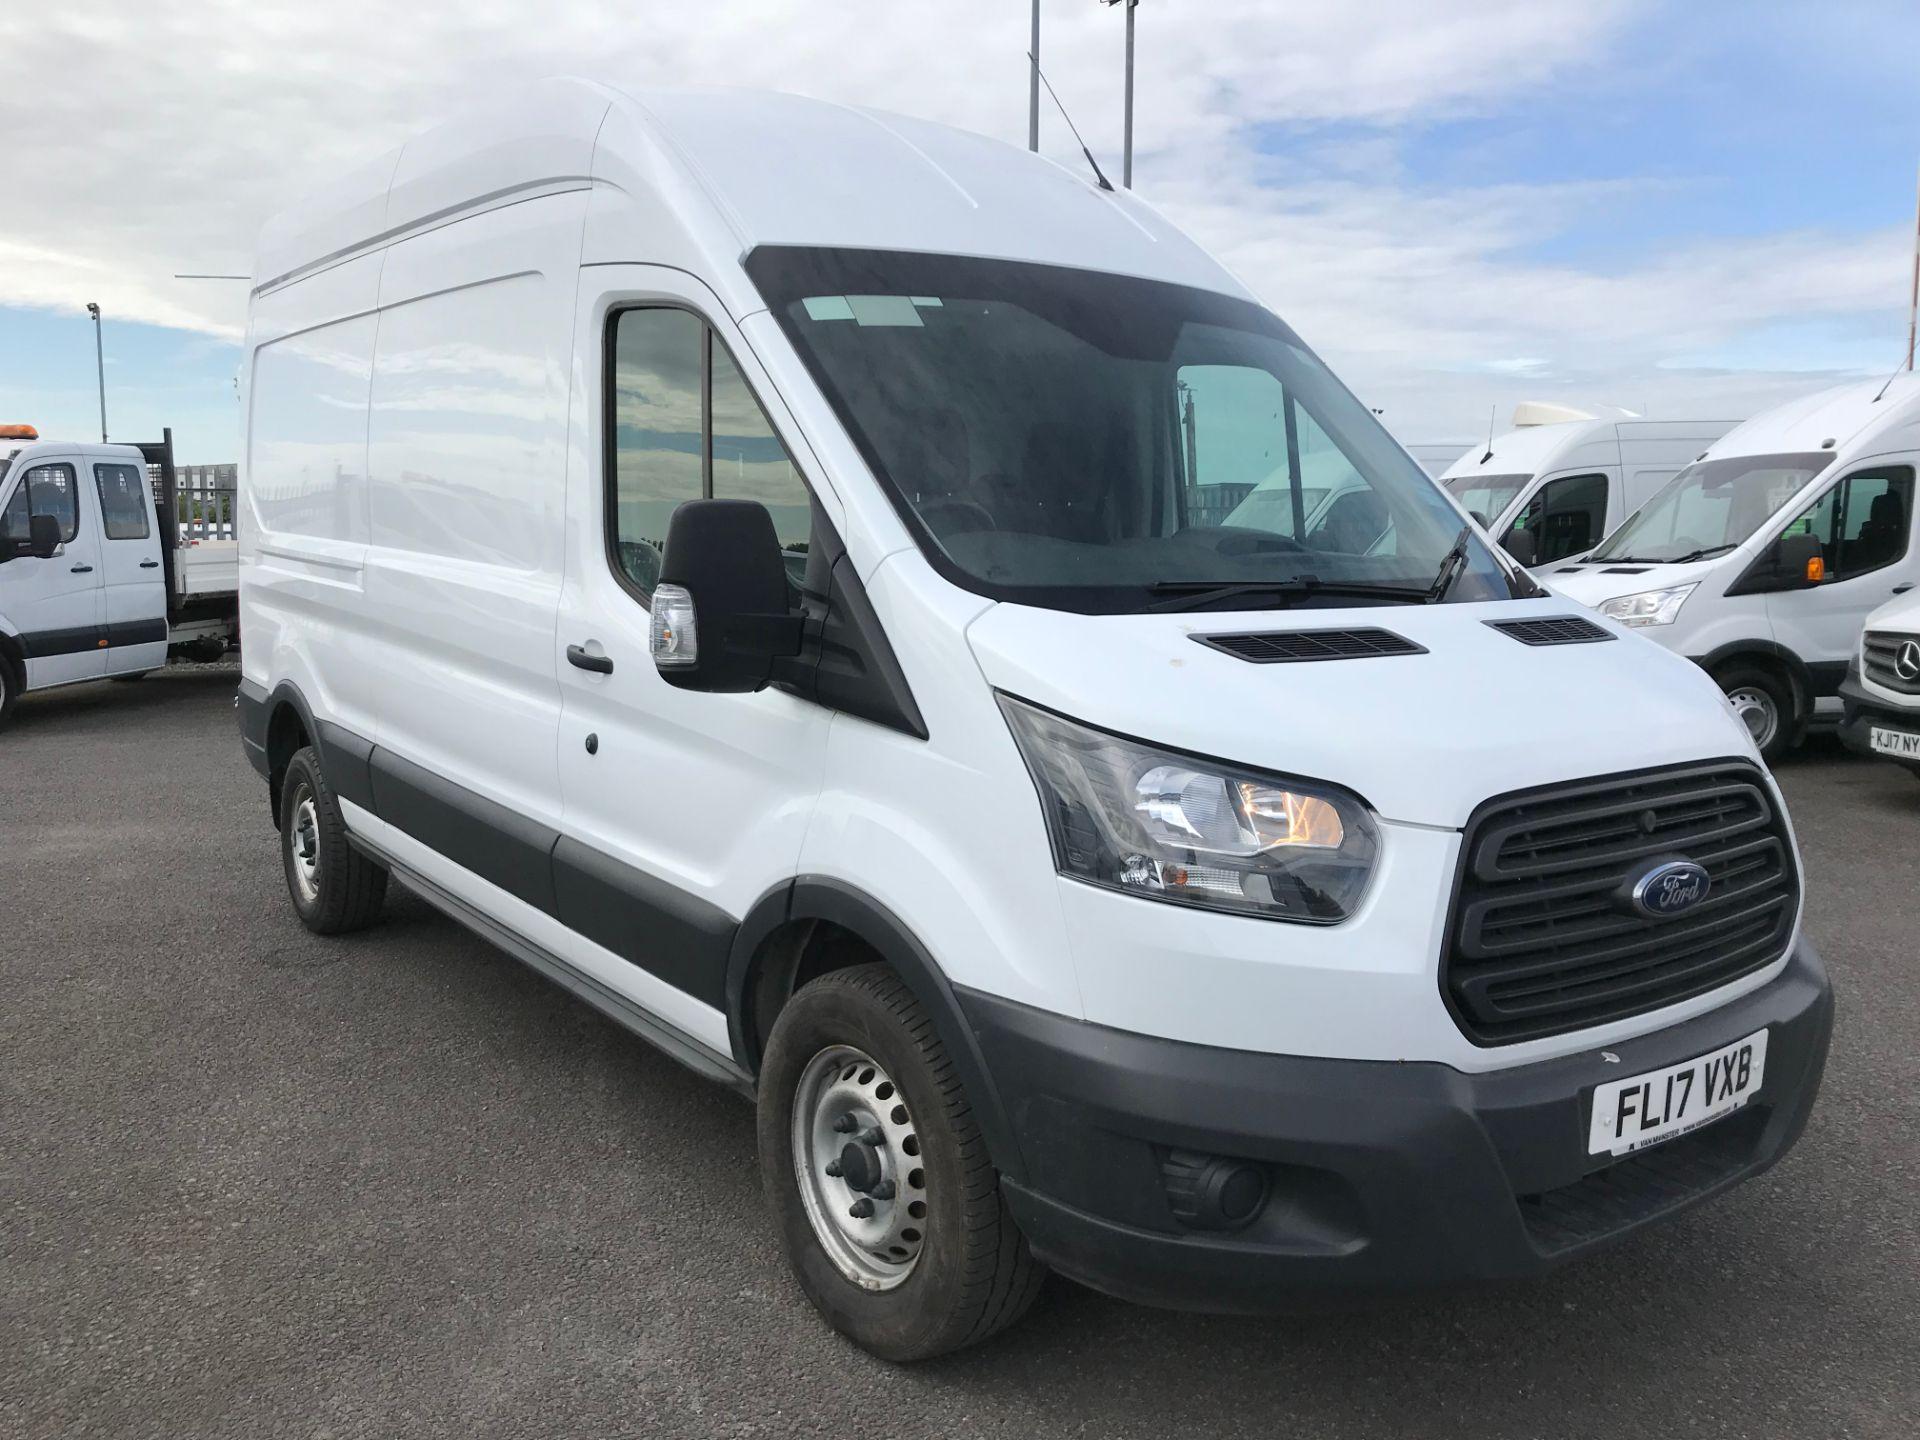 2017 Ford Transit 2.0 Tdci 130Ps H3 Van (FL17VXB)